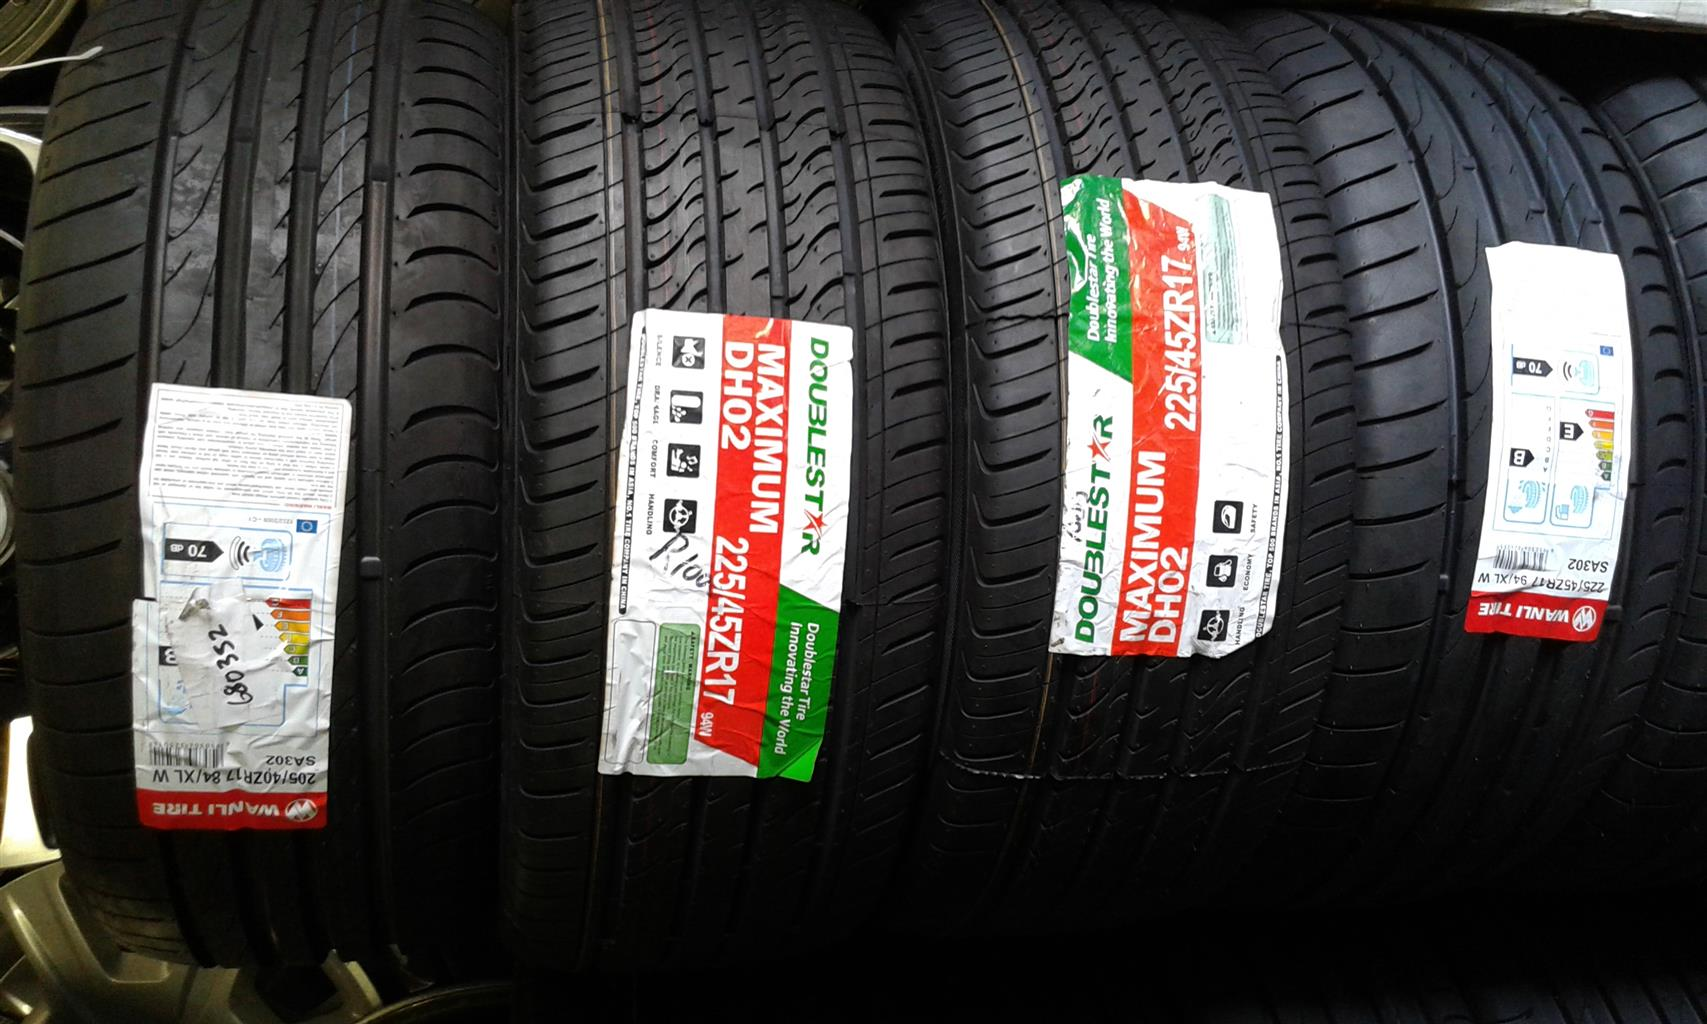 Am selling Bridgestone tyres run flat size 225/45/17 | Junk Mail